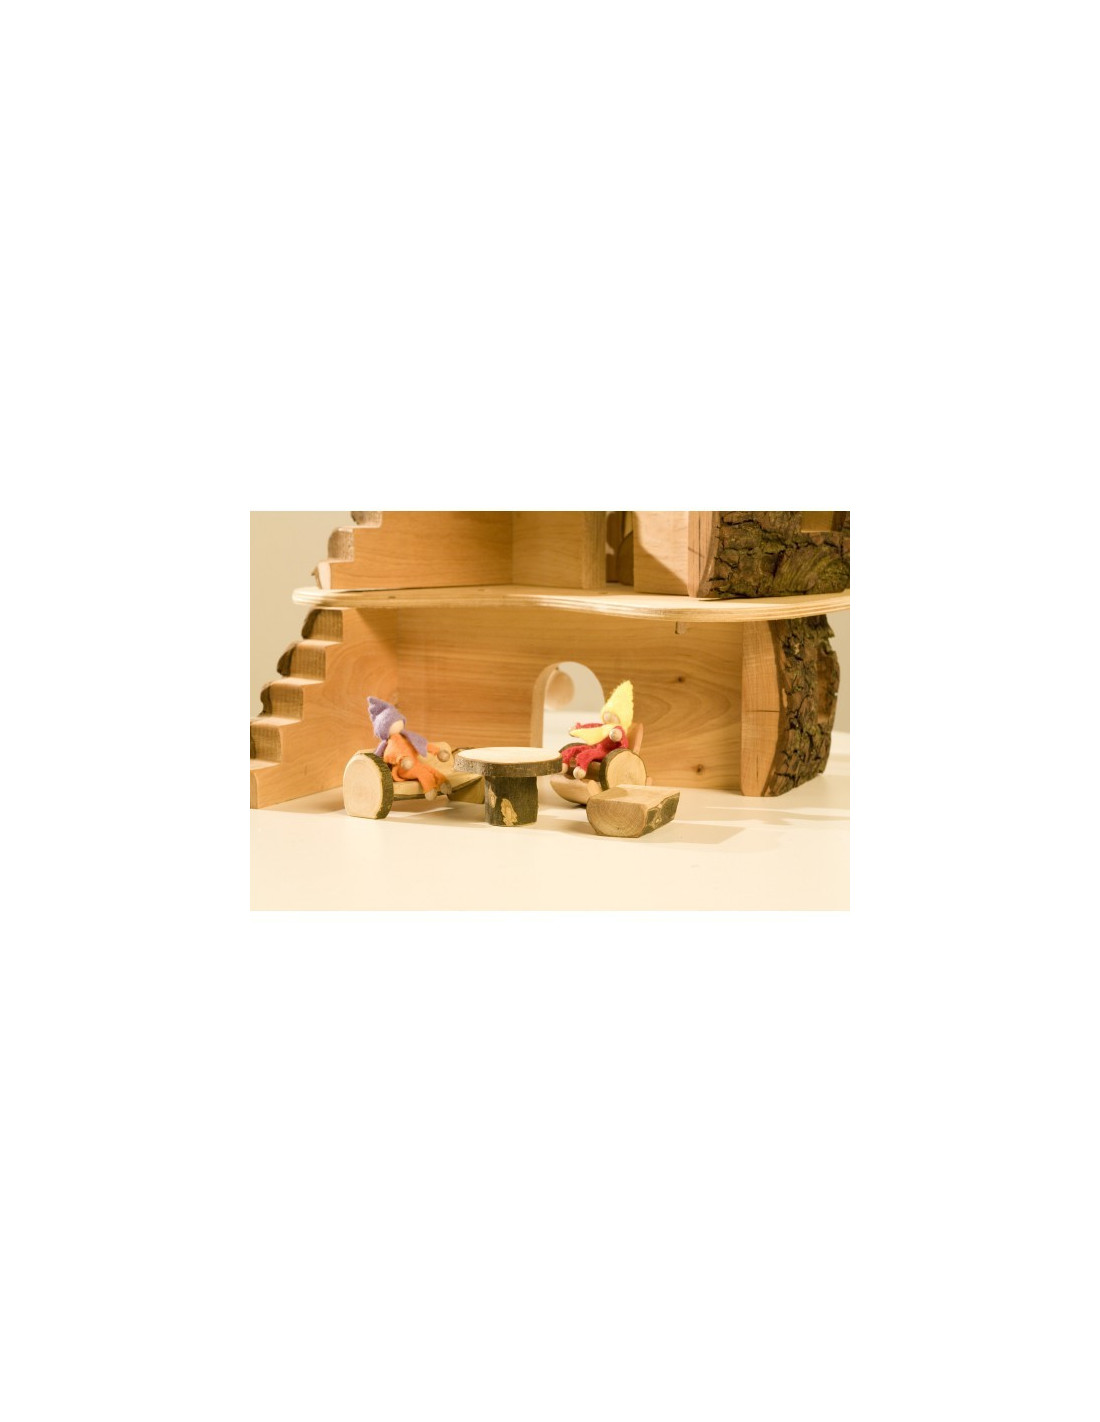 Tweedehands Hoekbank Tilburg  Wicker loungeset loungesets tilburg  Ikea woonkamer hoekbanken